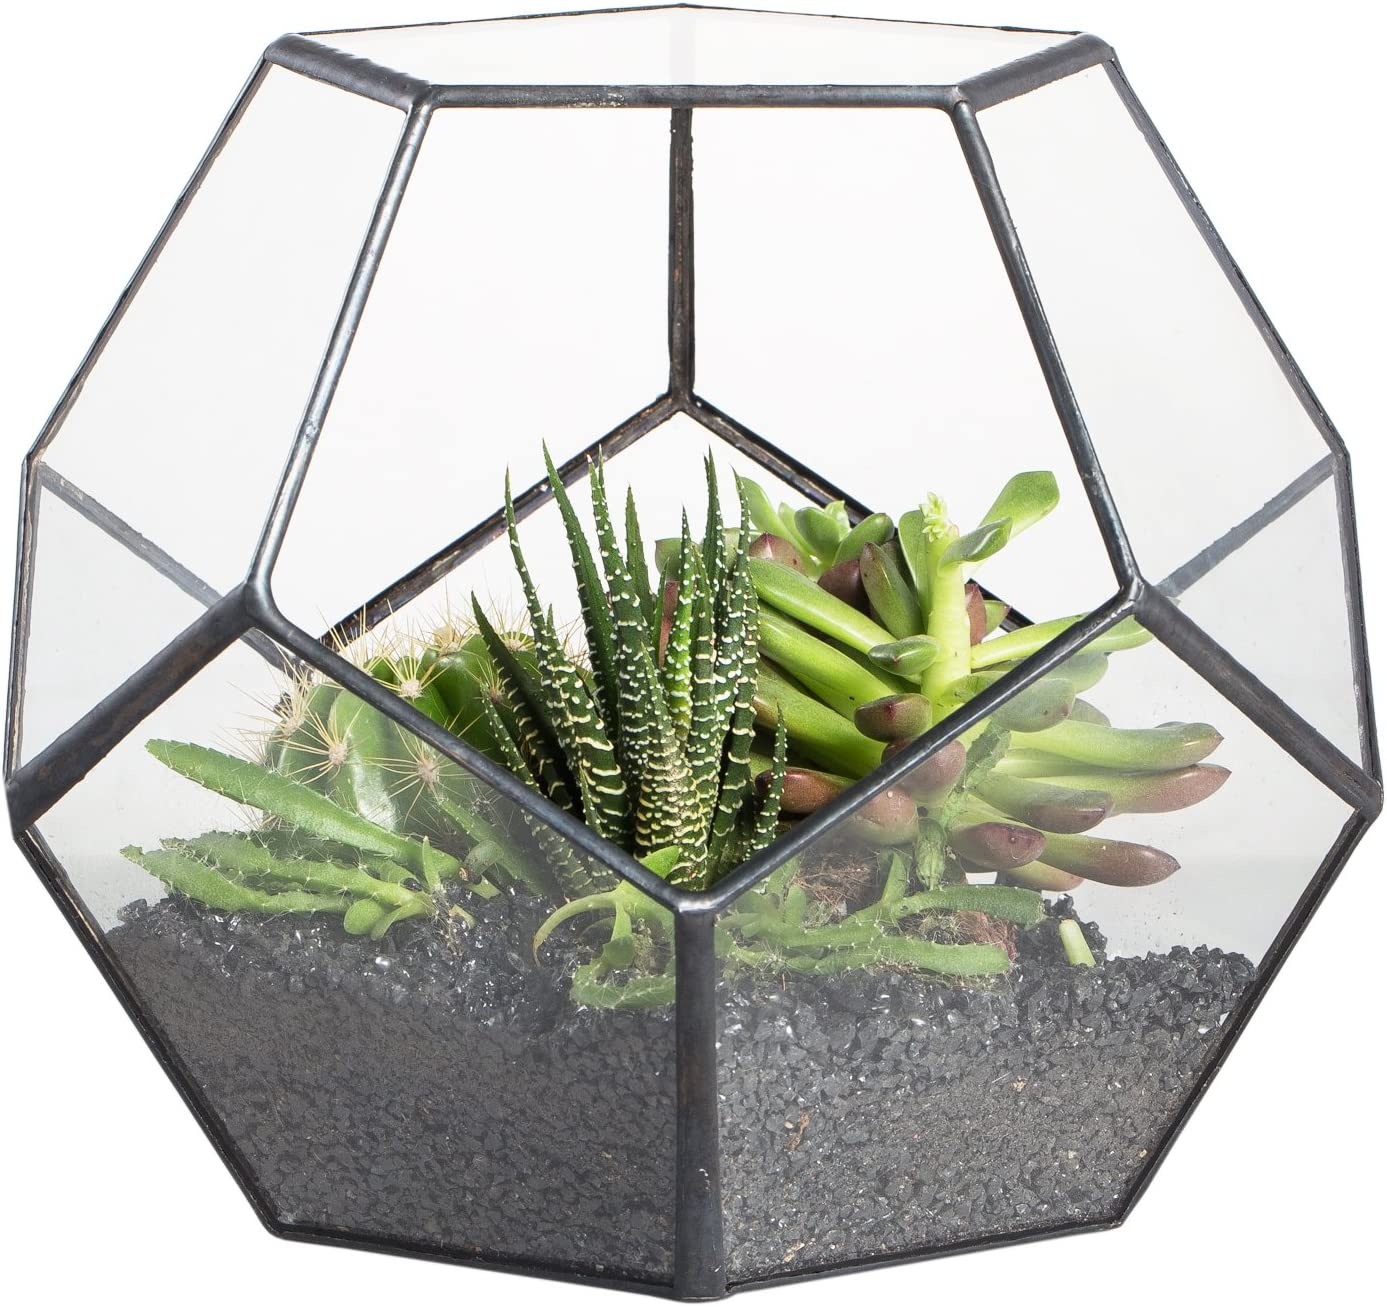 Black Glass Geometric Terrarium Container Modern Tabletop Window Sill Decor Flower Pot Balcony Planter Diy Display Box for Succulent Fern Moss Air Plants Miniature Fairy Garden Gift (No Plants): Garden & Outdoor